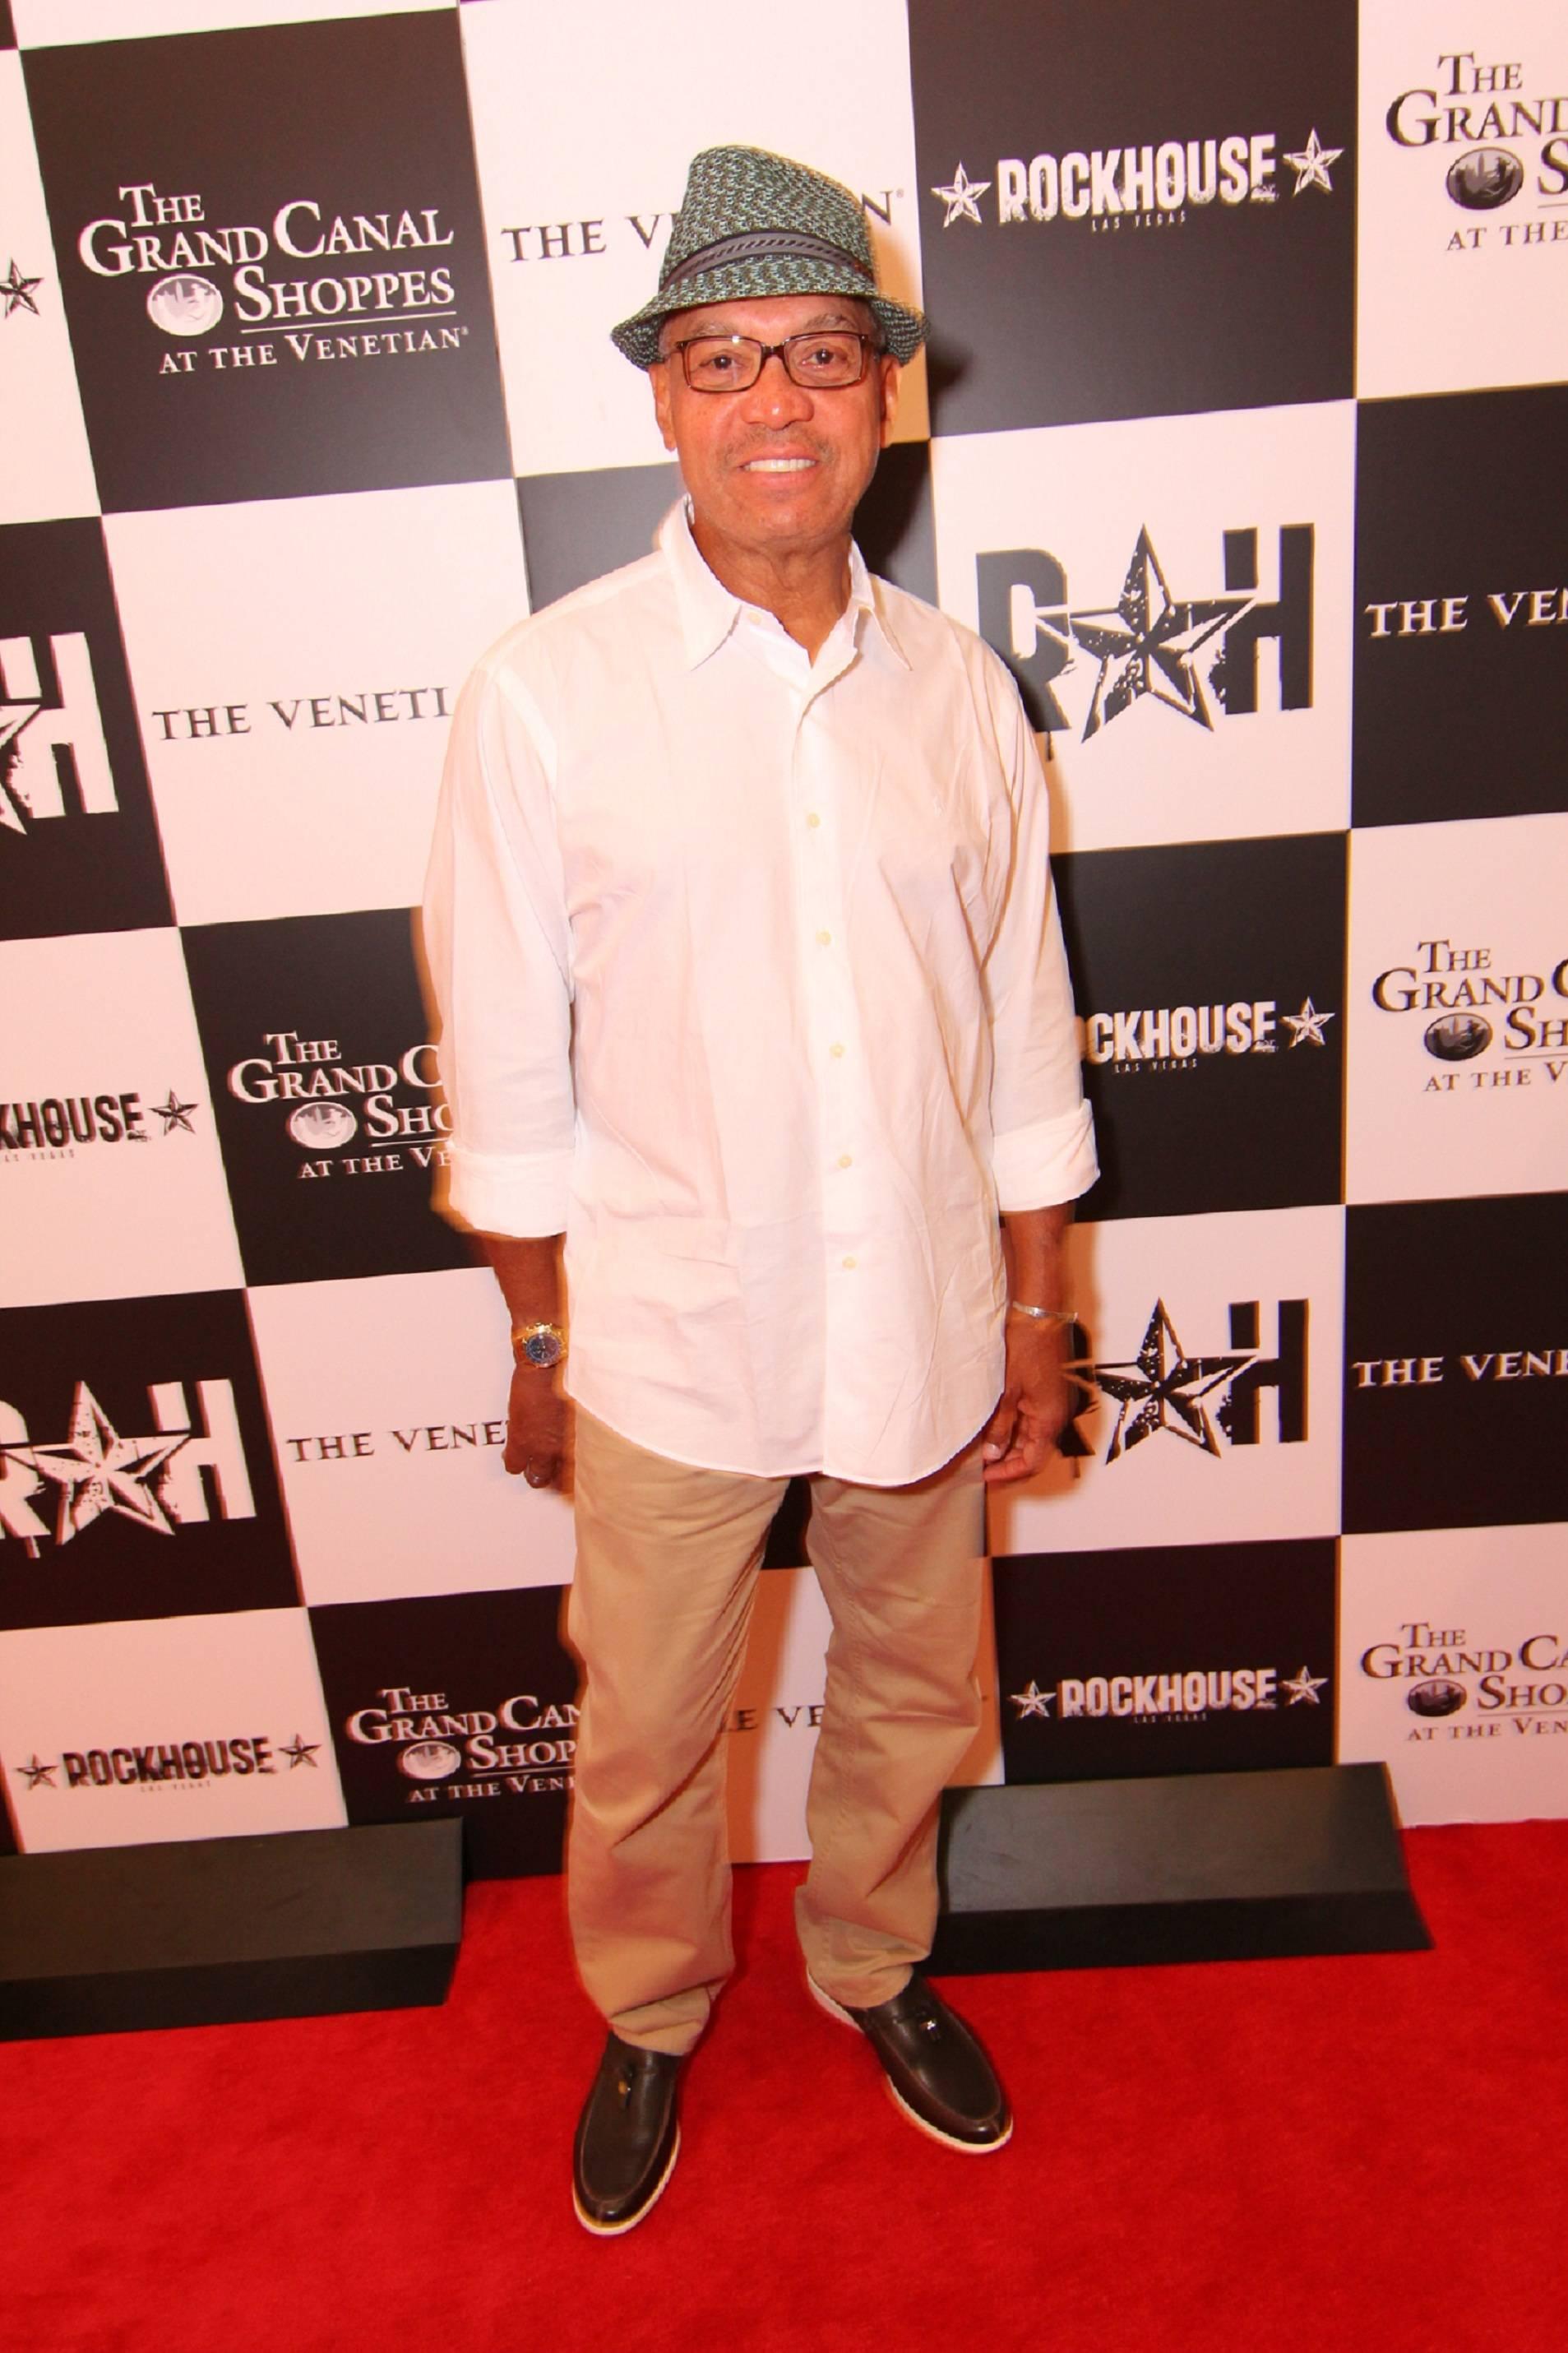 Reggie Jackson Poses at Rockhouse